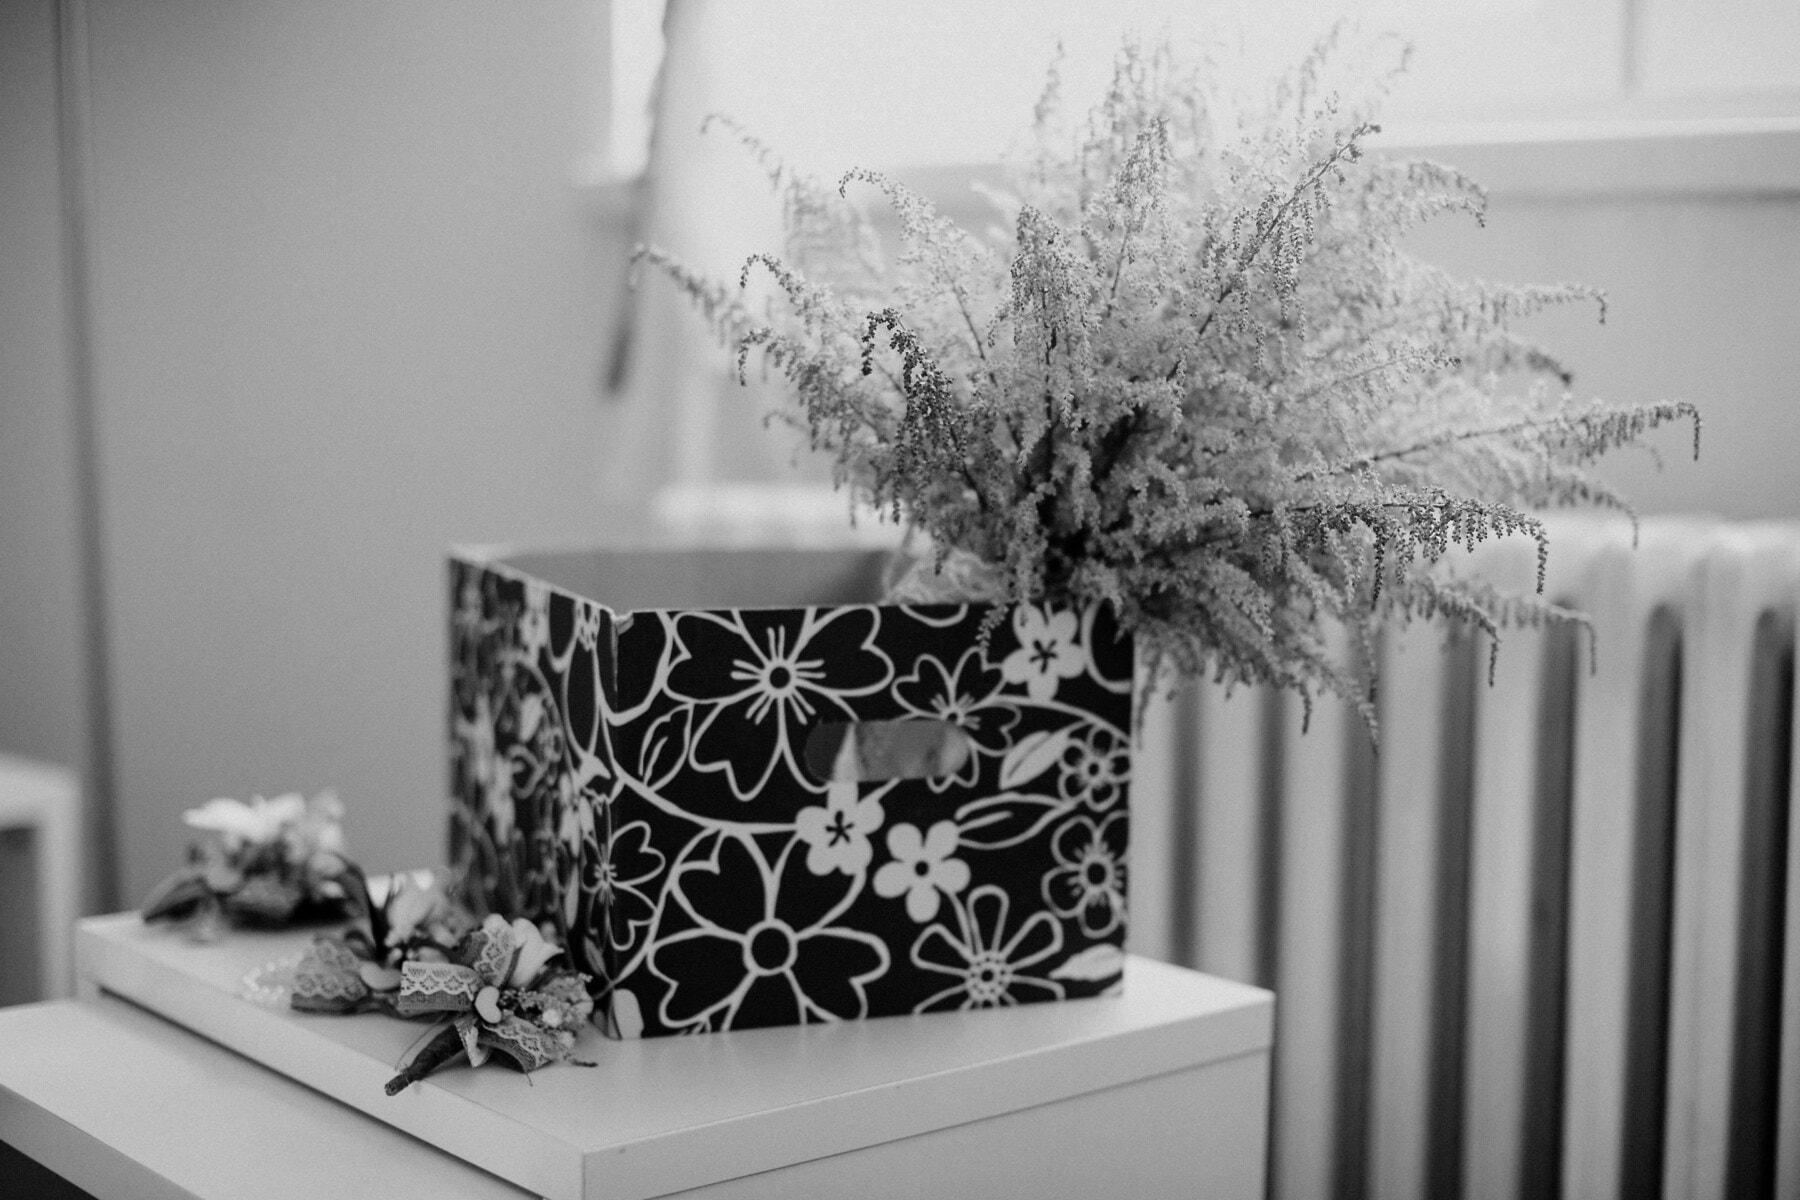 box, flowers, bouquet, black and white, gifts, interior decoration, flower, monochrome, interior design, art